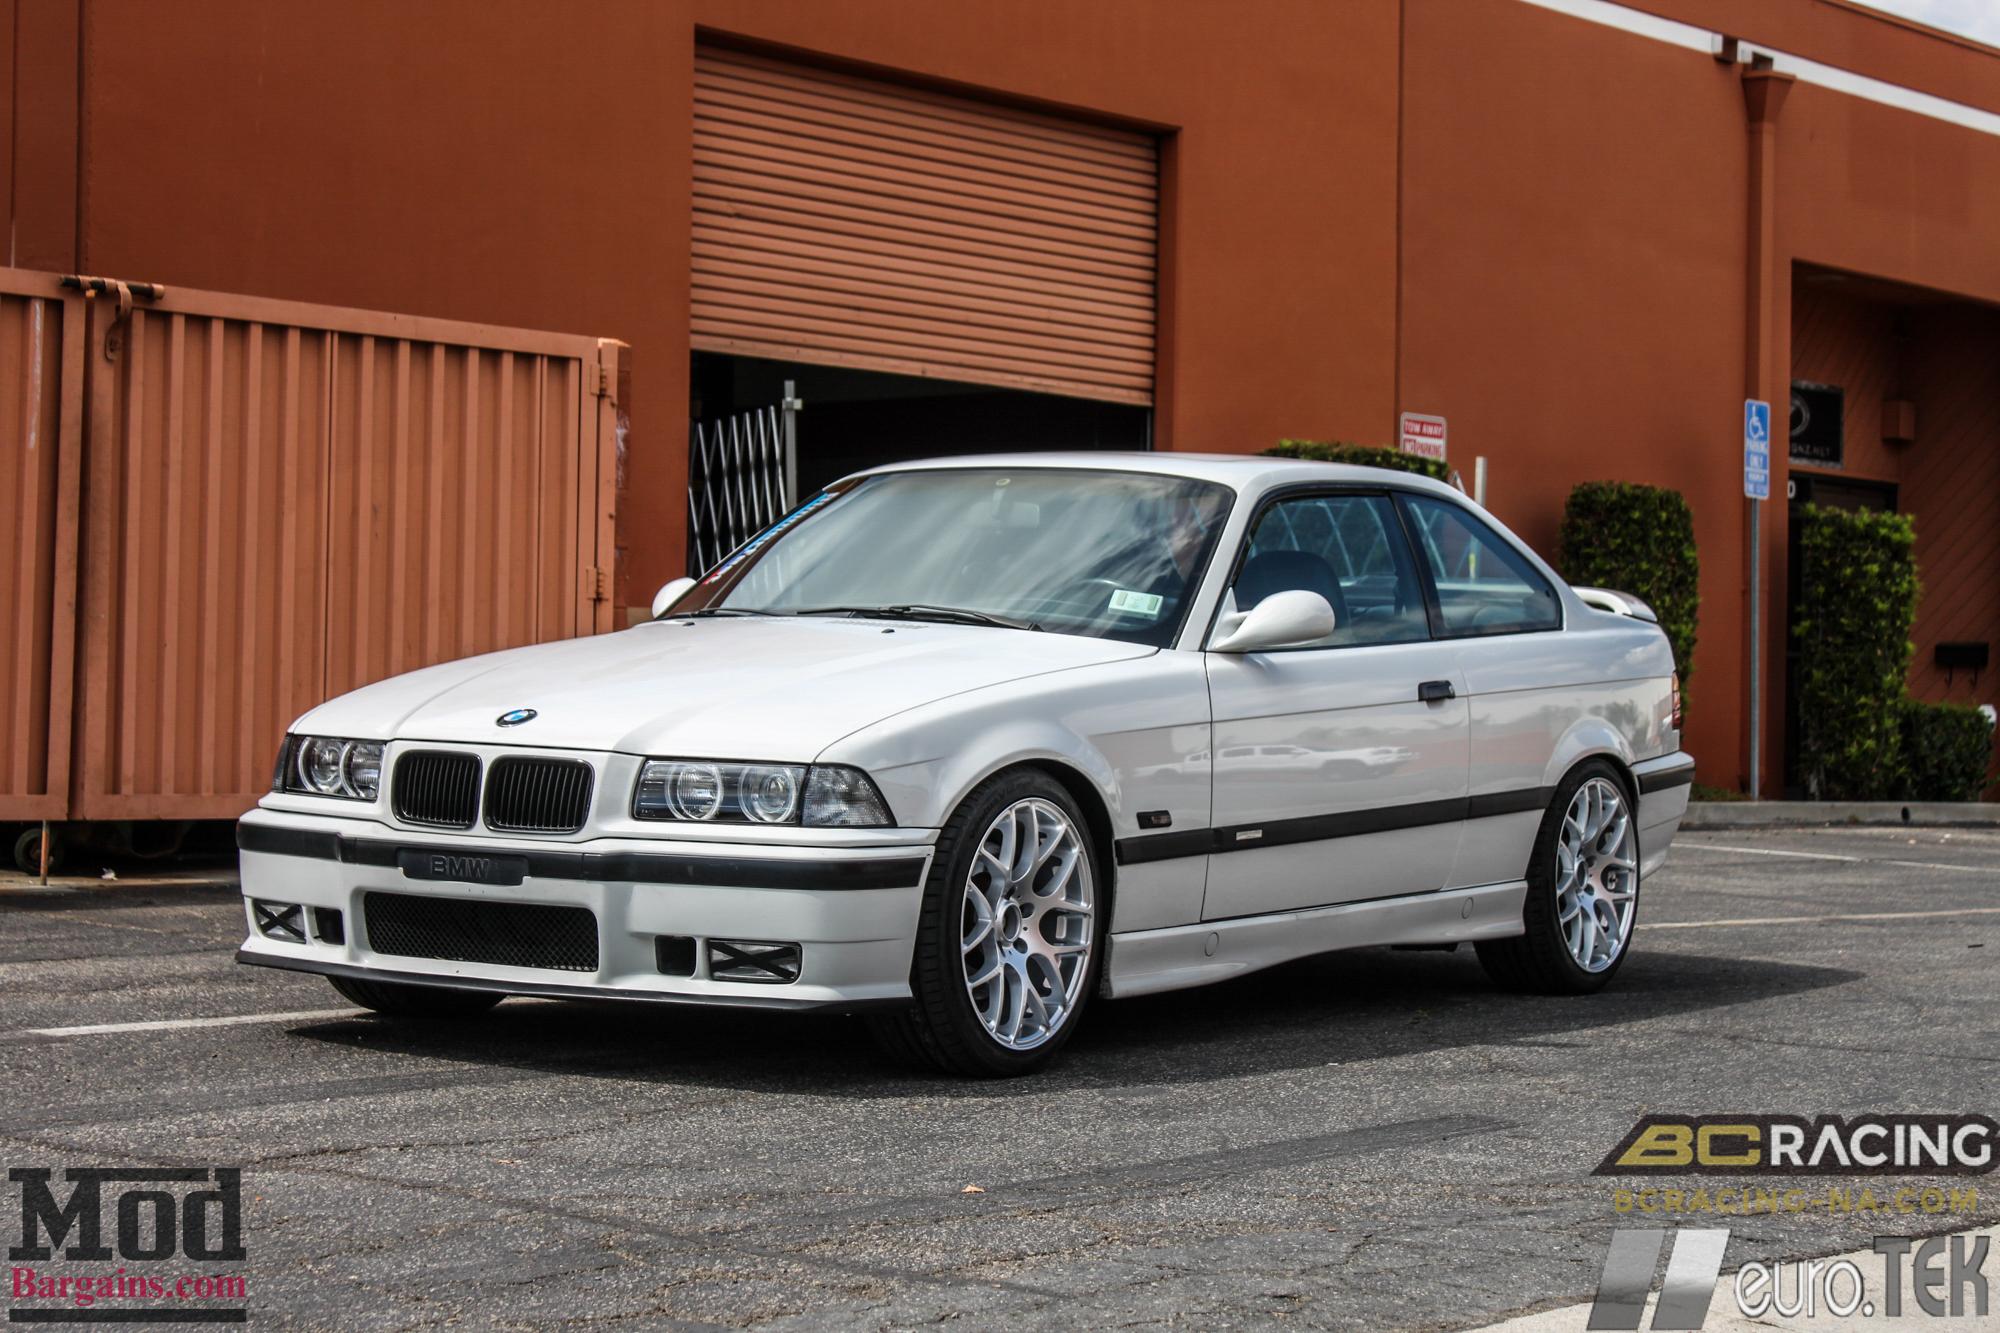 Hankook Ventus V12 Evo2 >> E36 BMW M3 on BC Coilovers + Eurotek Wheels